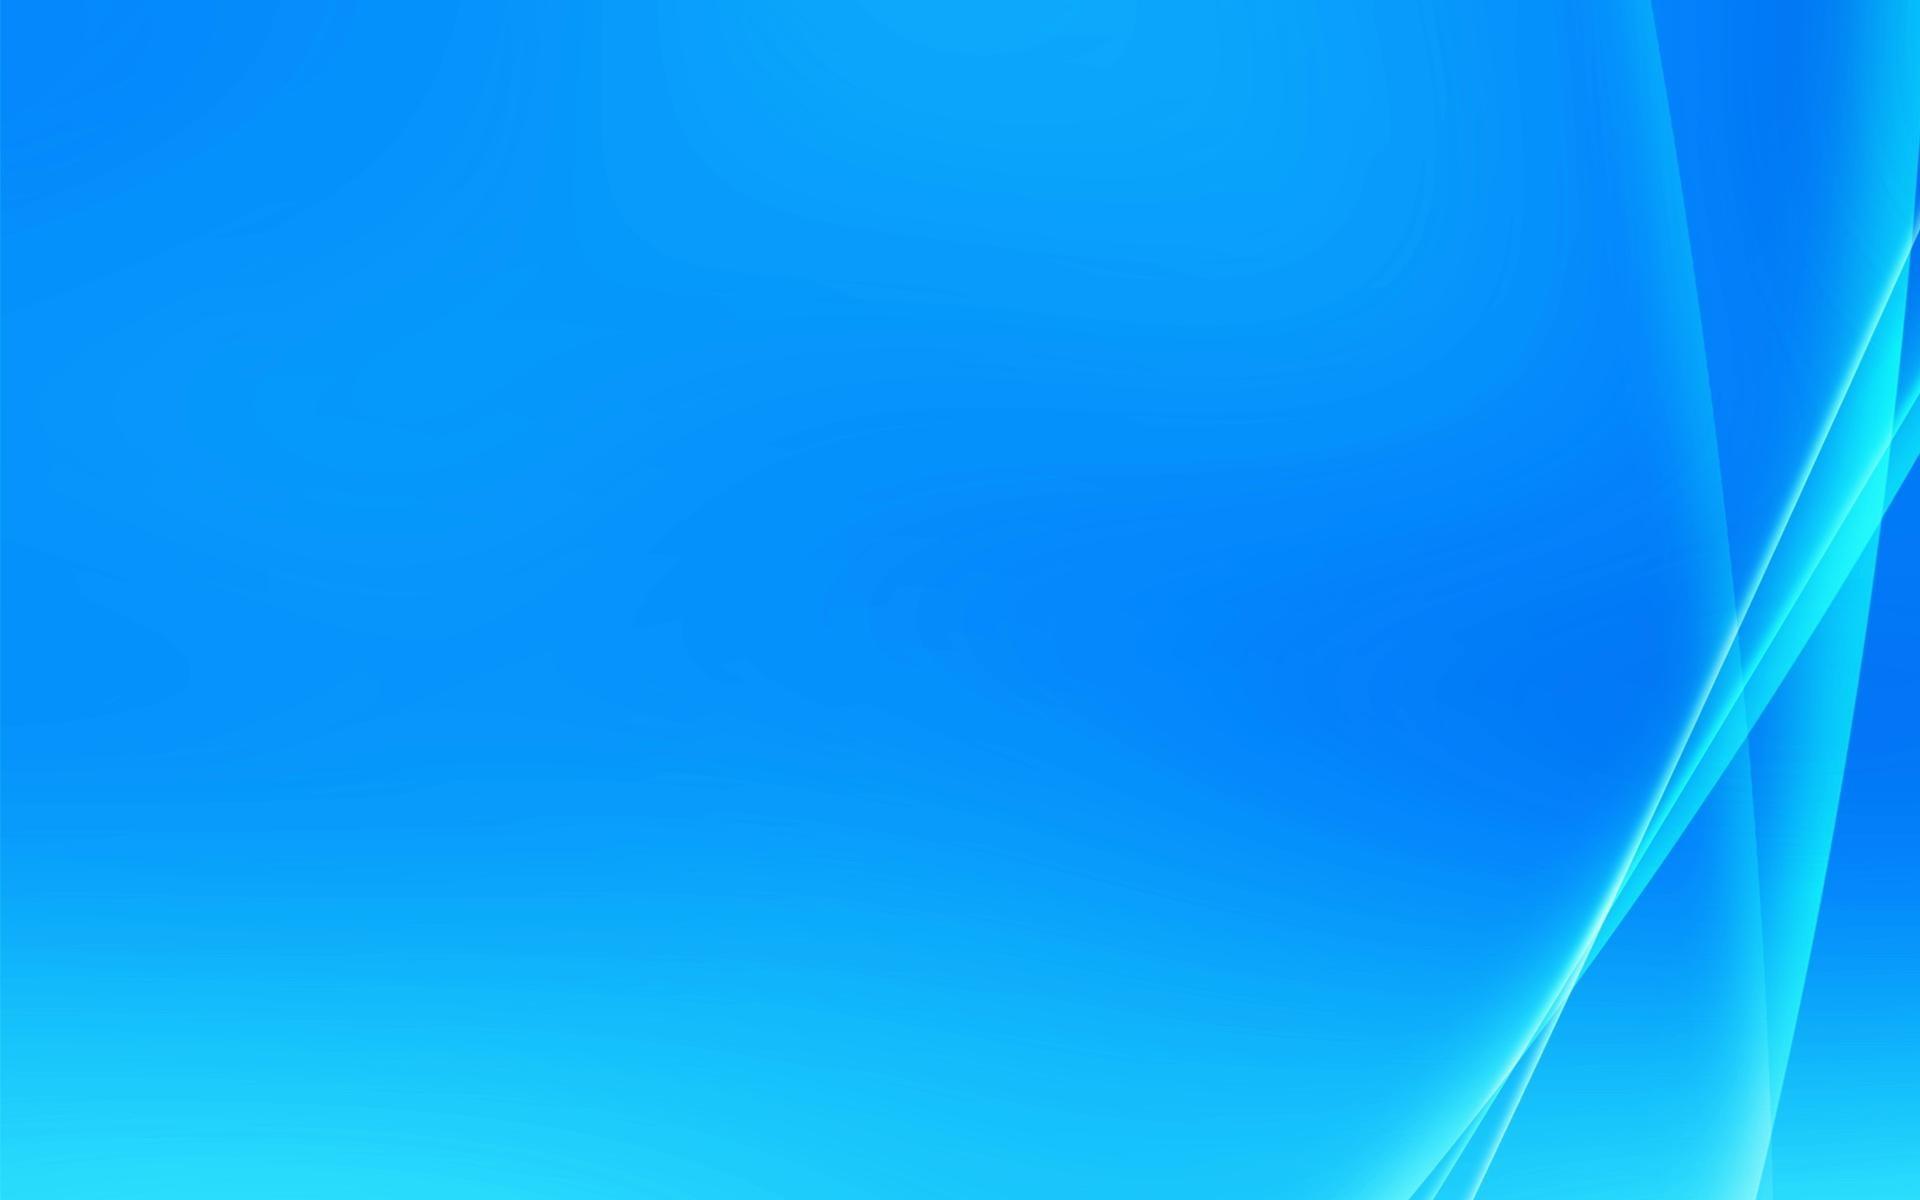 The-color-blue-wallpaper-hd